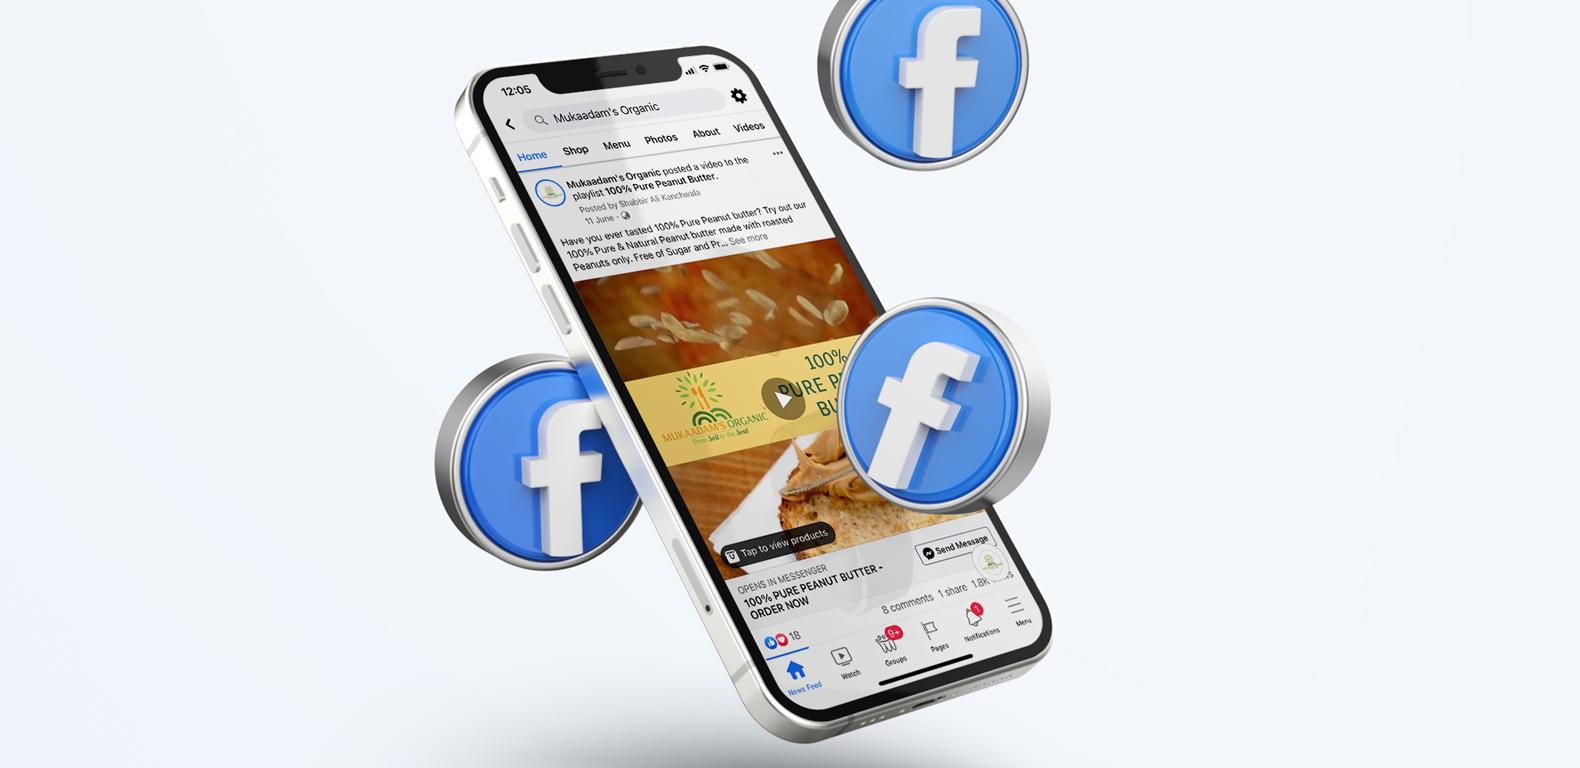 social-media-marketing-mukaadams-organic-facebook-posts-4